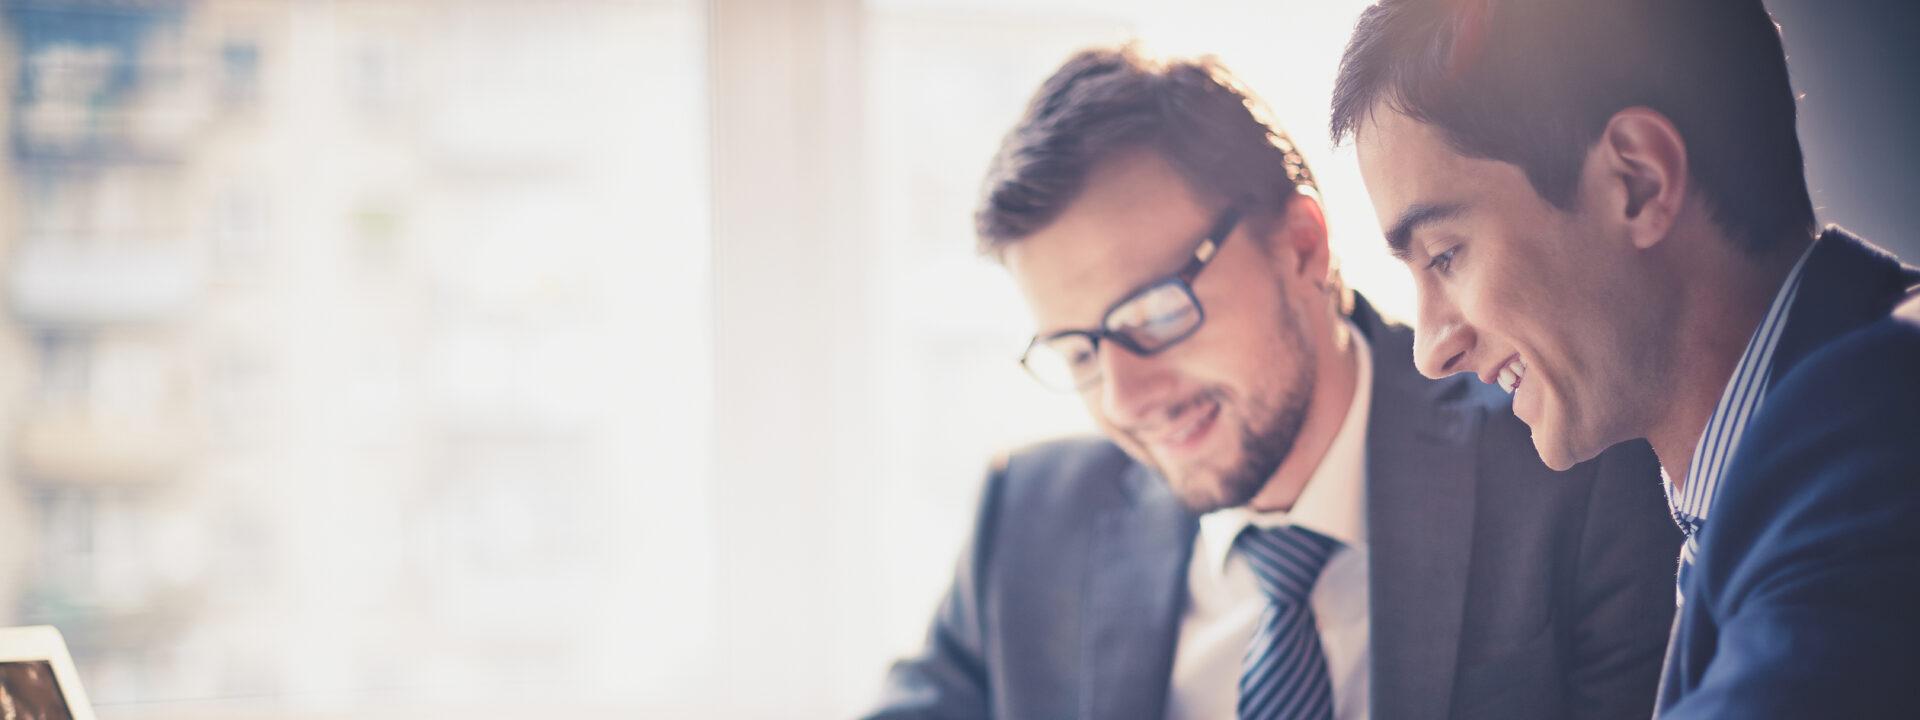 Van klanttevredenheid naar klantbeleving